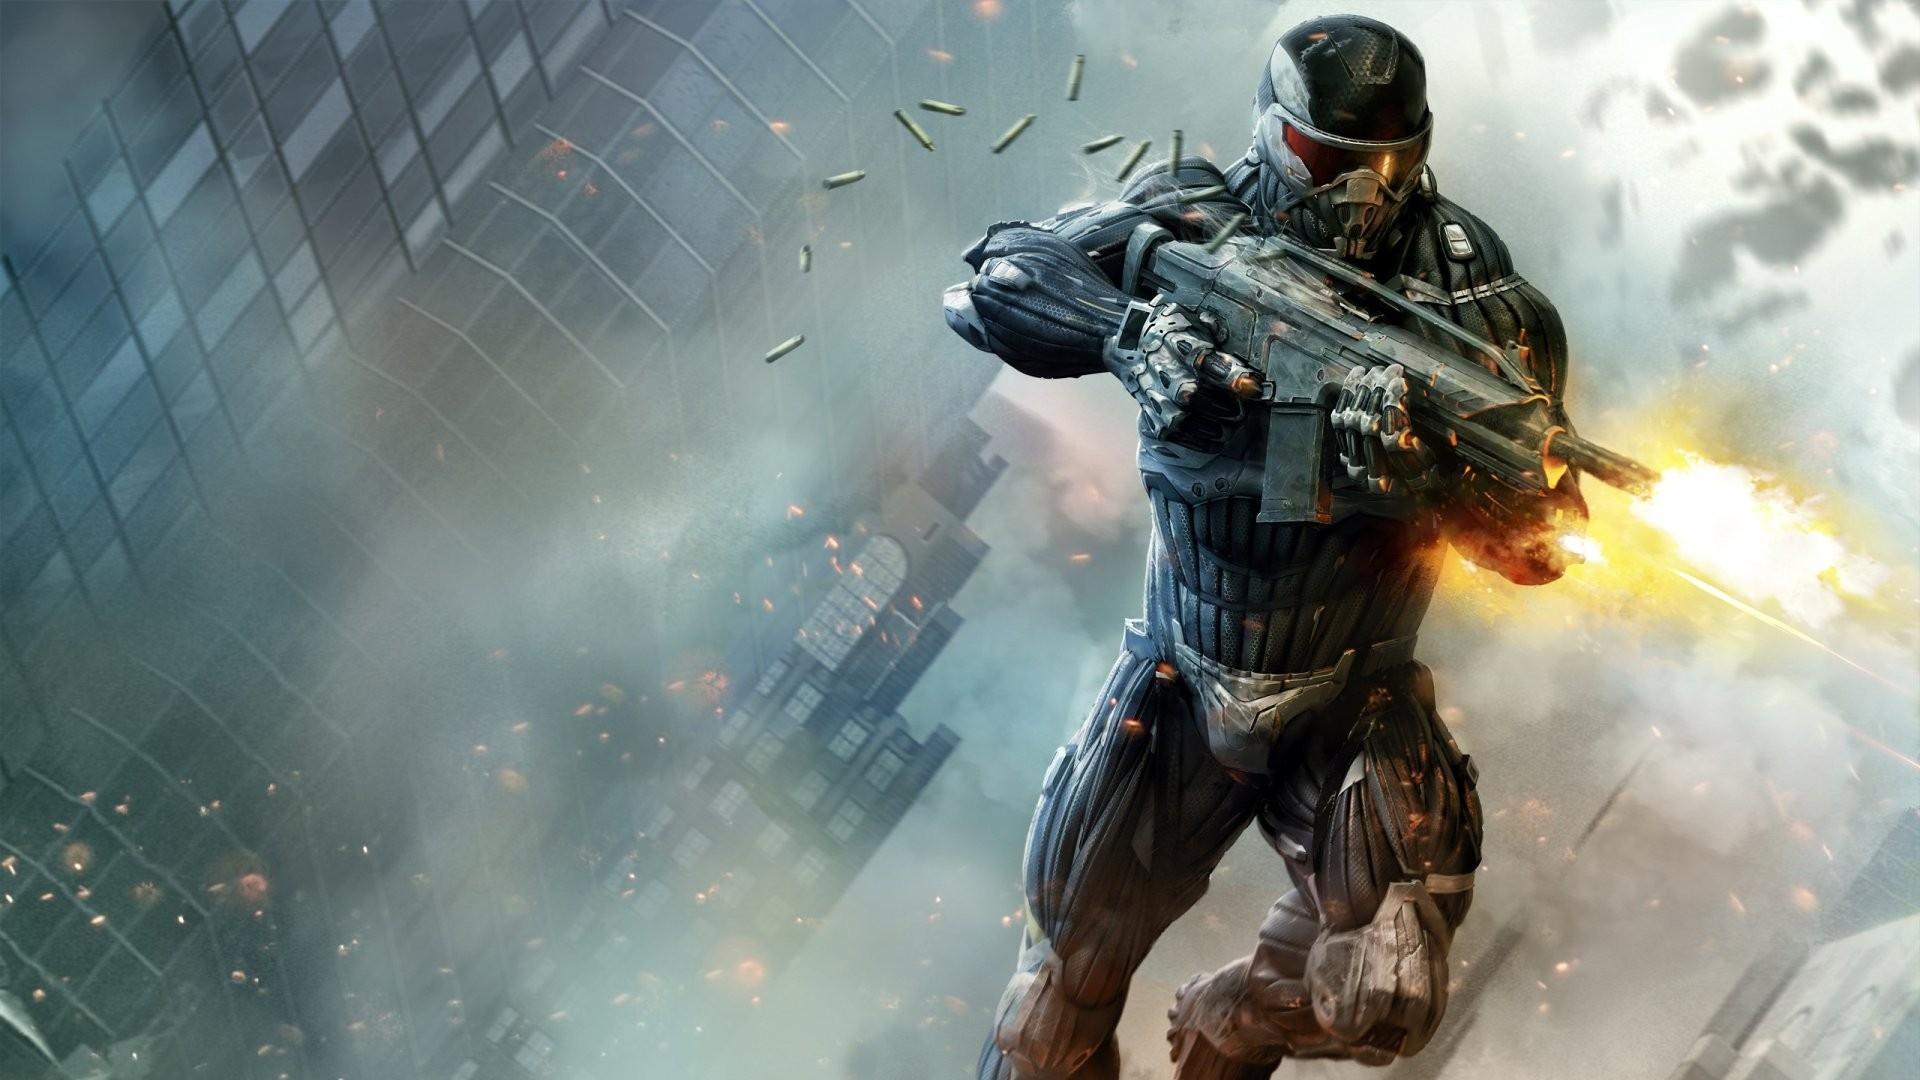 Download-crysis-gun-shooting-city-sleeves-alcatraz-for-Ipad-%C2%AB-Kuff-Games-wallpaper-wp3604989